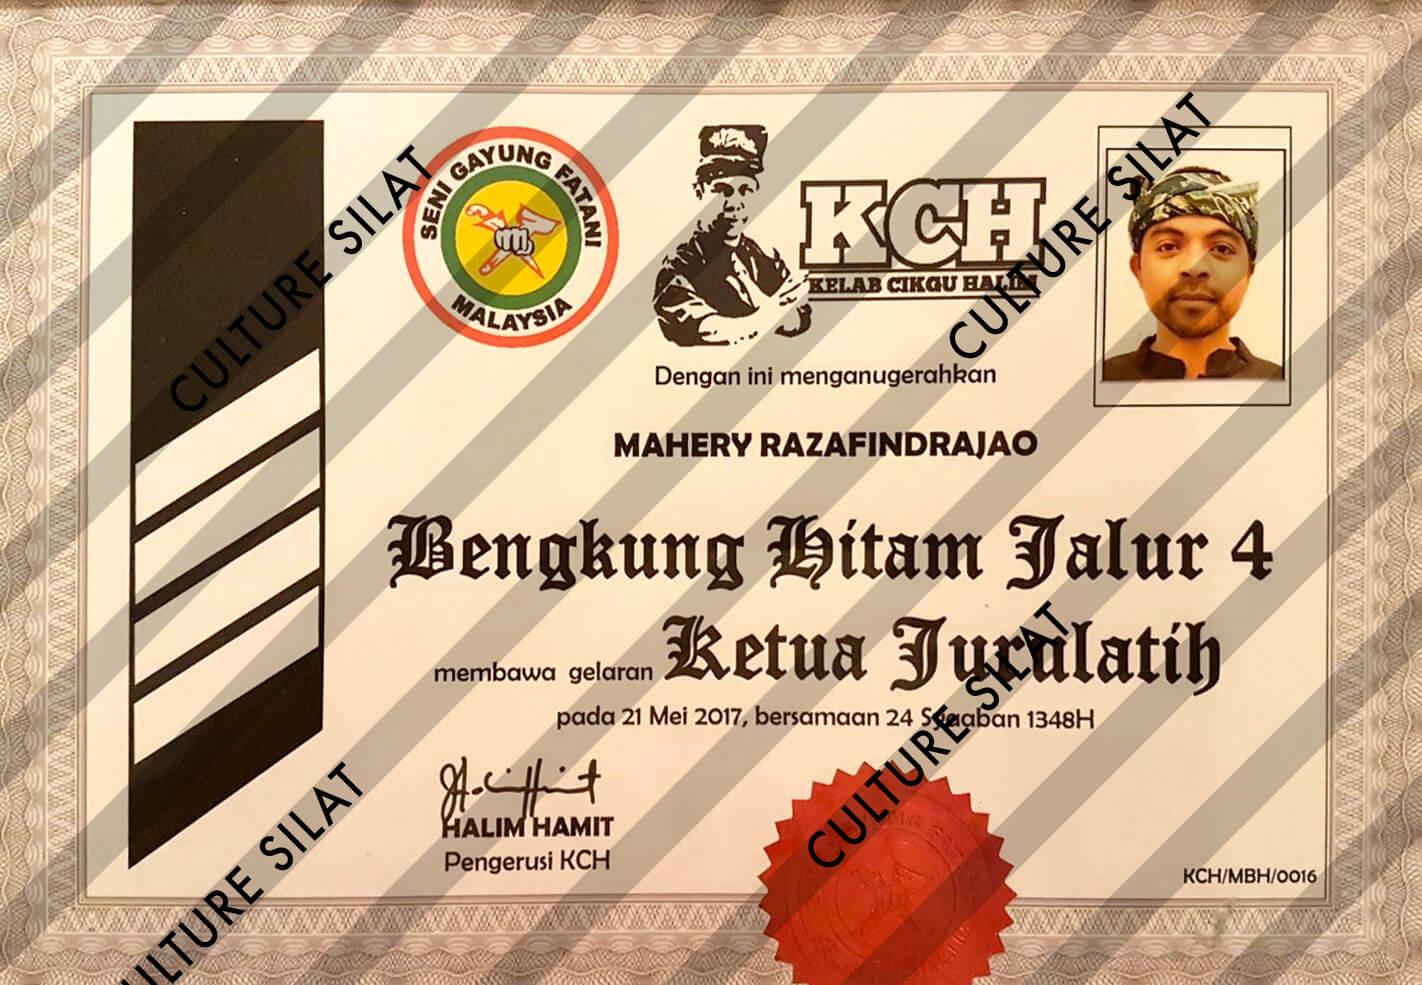 Cikgu Mahery Razafindrajao - Sijil Ketua Jurulatih